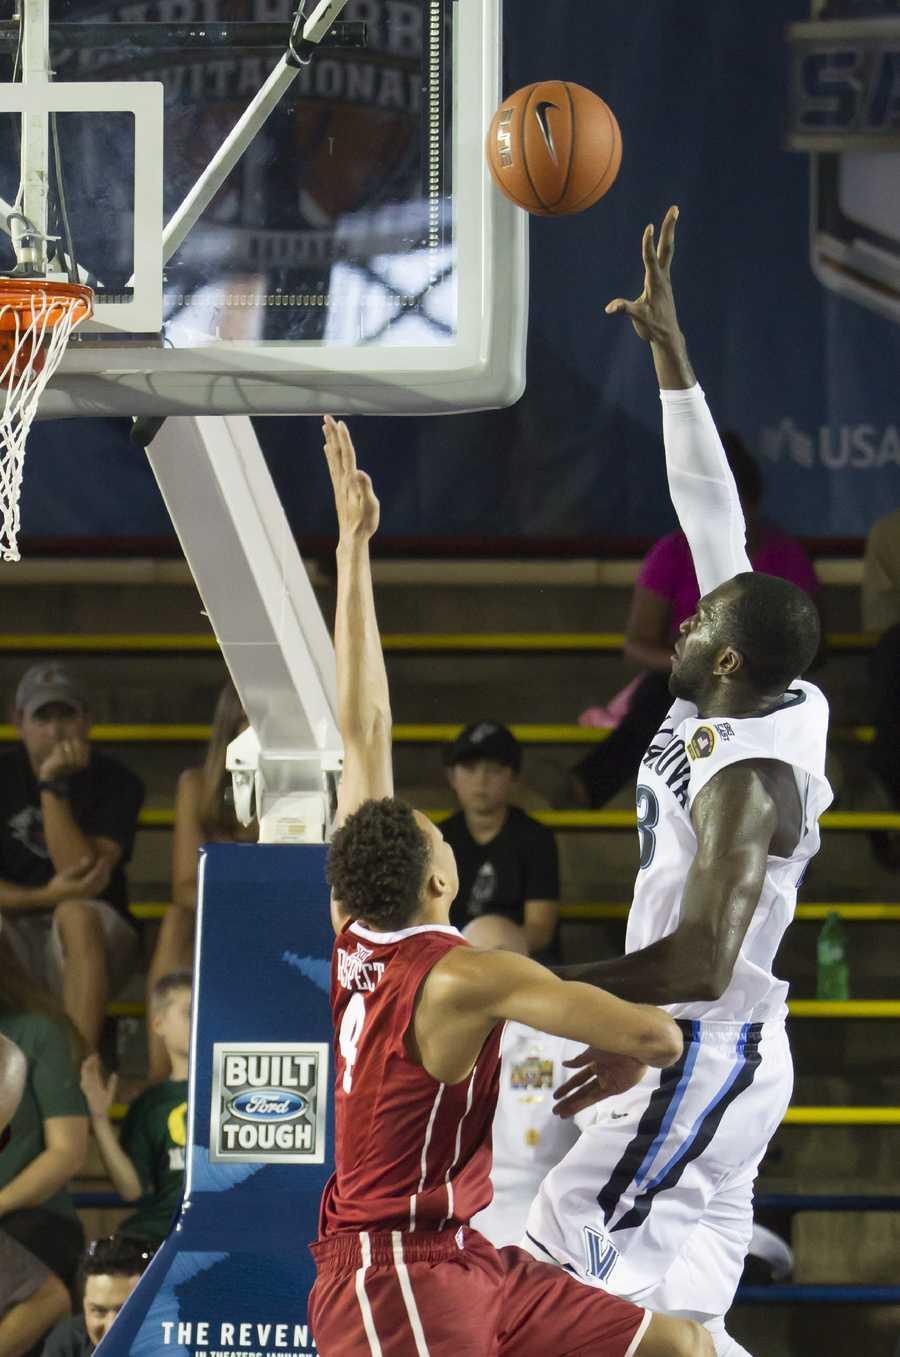 Villanova forward Daniel Ochefu, right, shoots over Oklahoma center Jamuni McNeace, left, in the first half of an NCAA college basketball game at the Pearl Harbor Invitational on Monday, Dec. 7, 2015, in Honolulu.